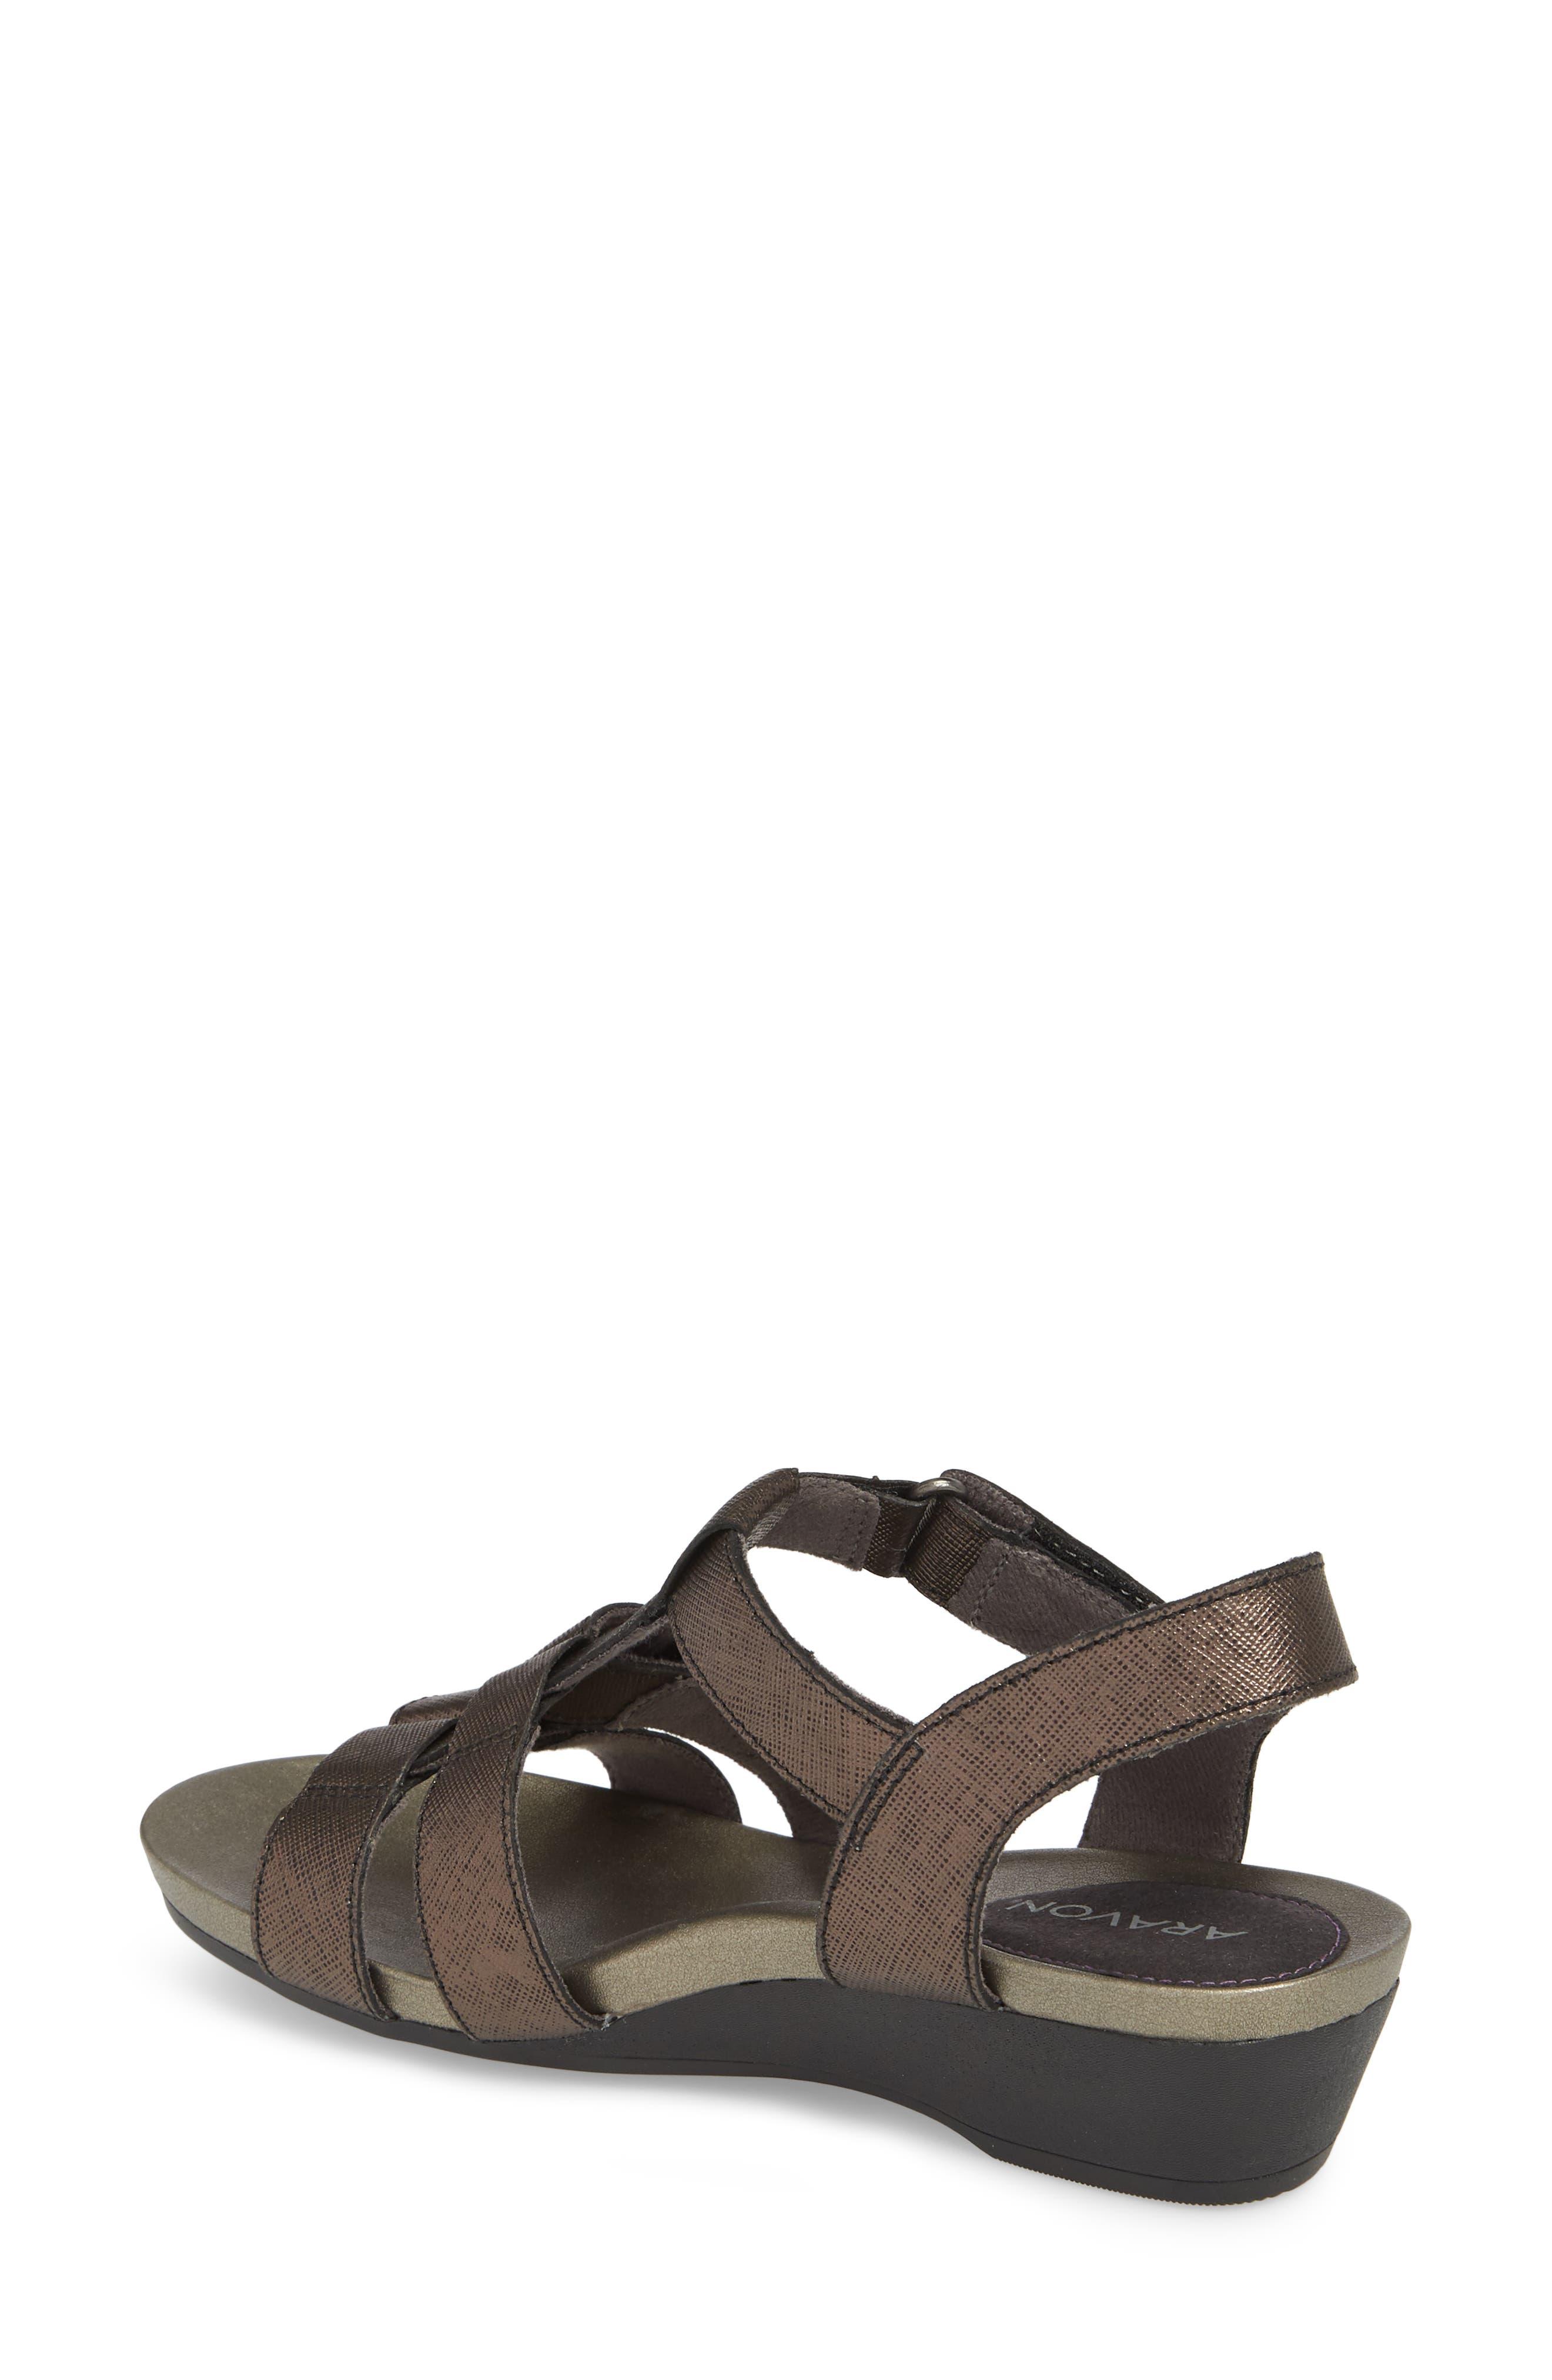 Standon Sandal,                             Alternate thumbnail 2, color,                             Black Leather